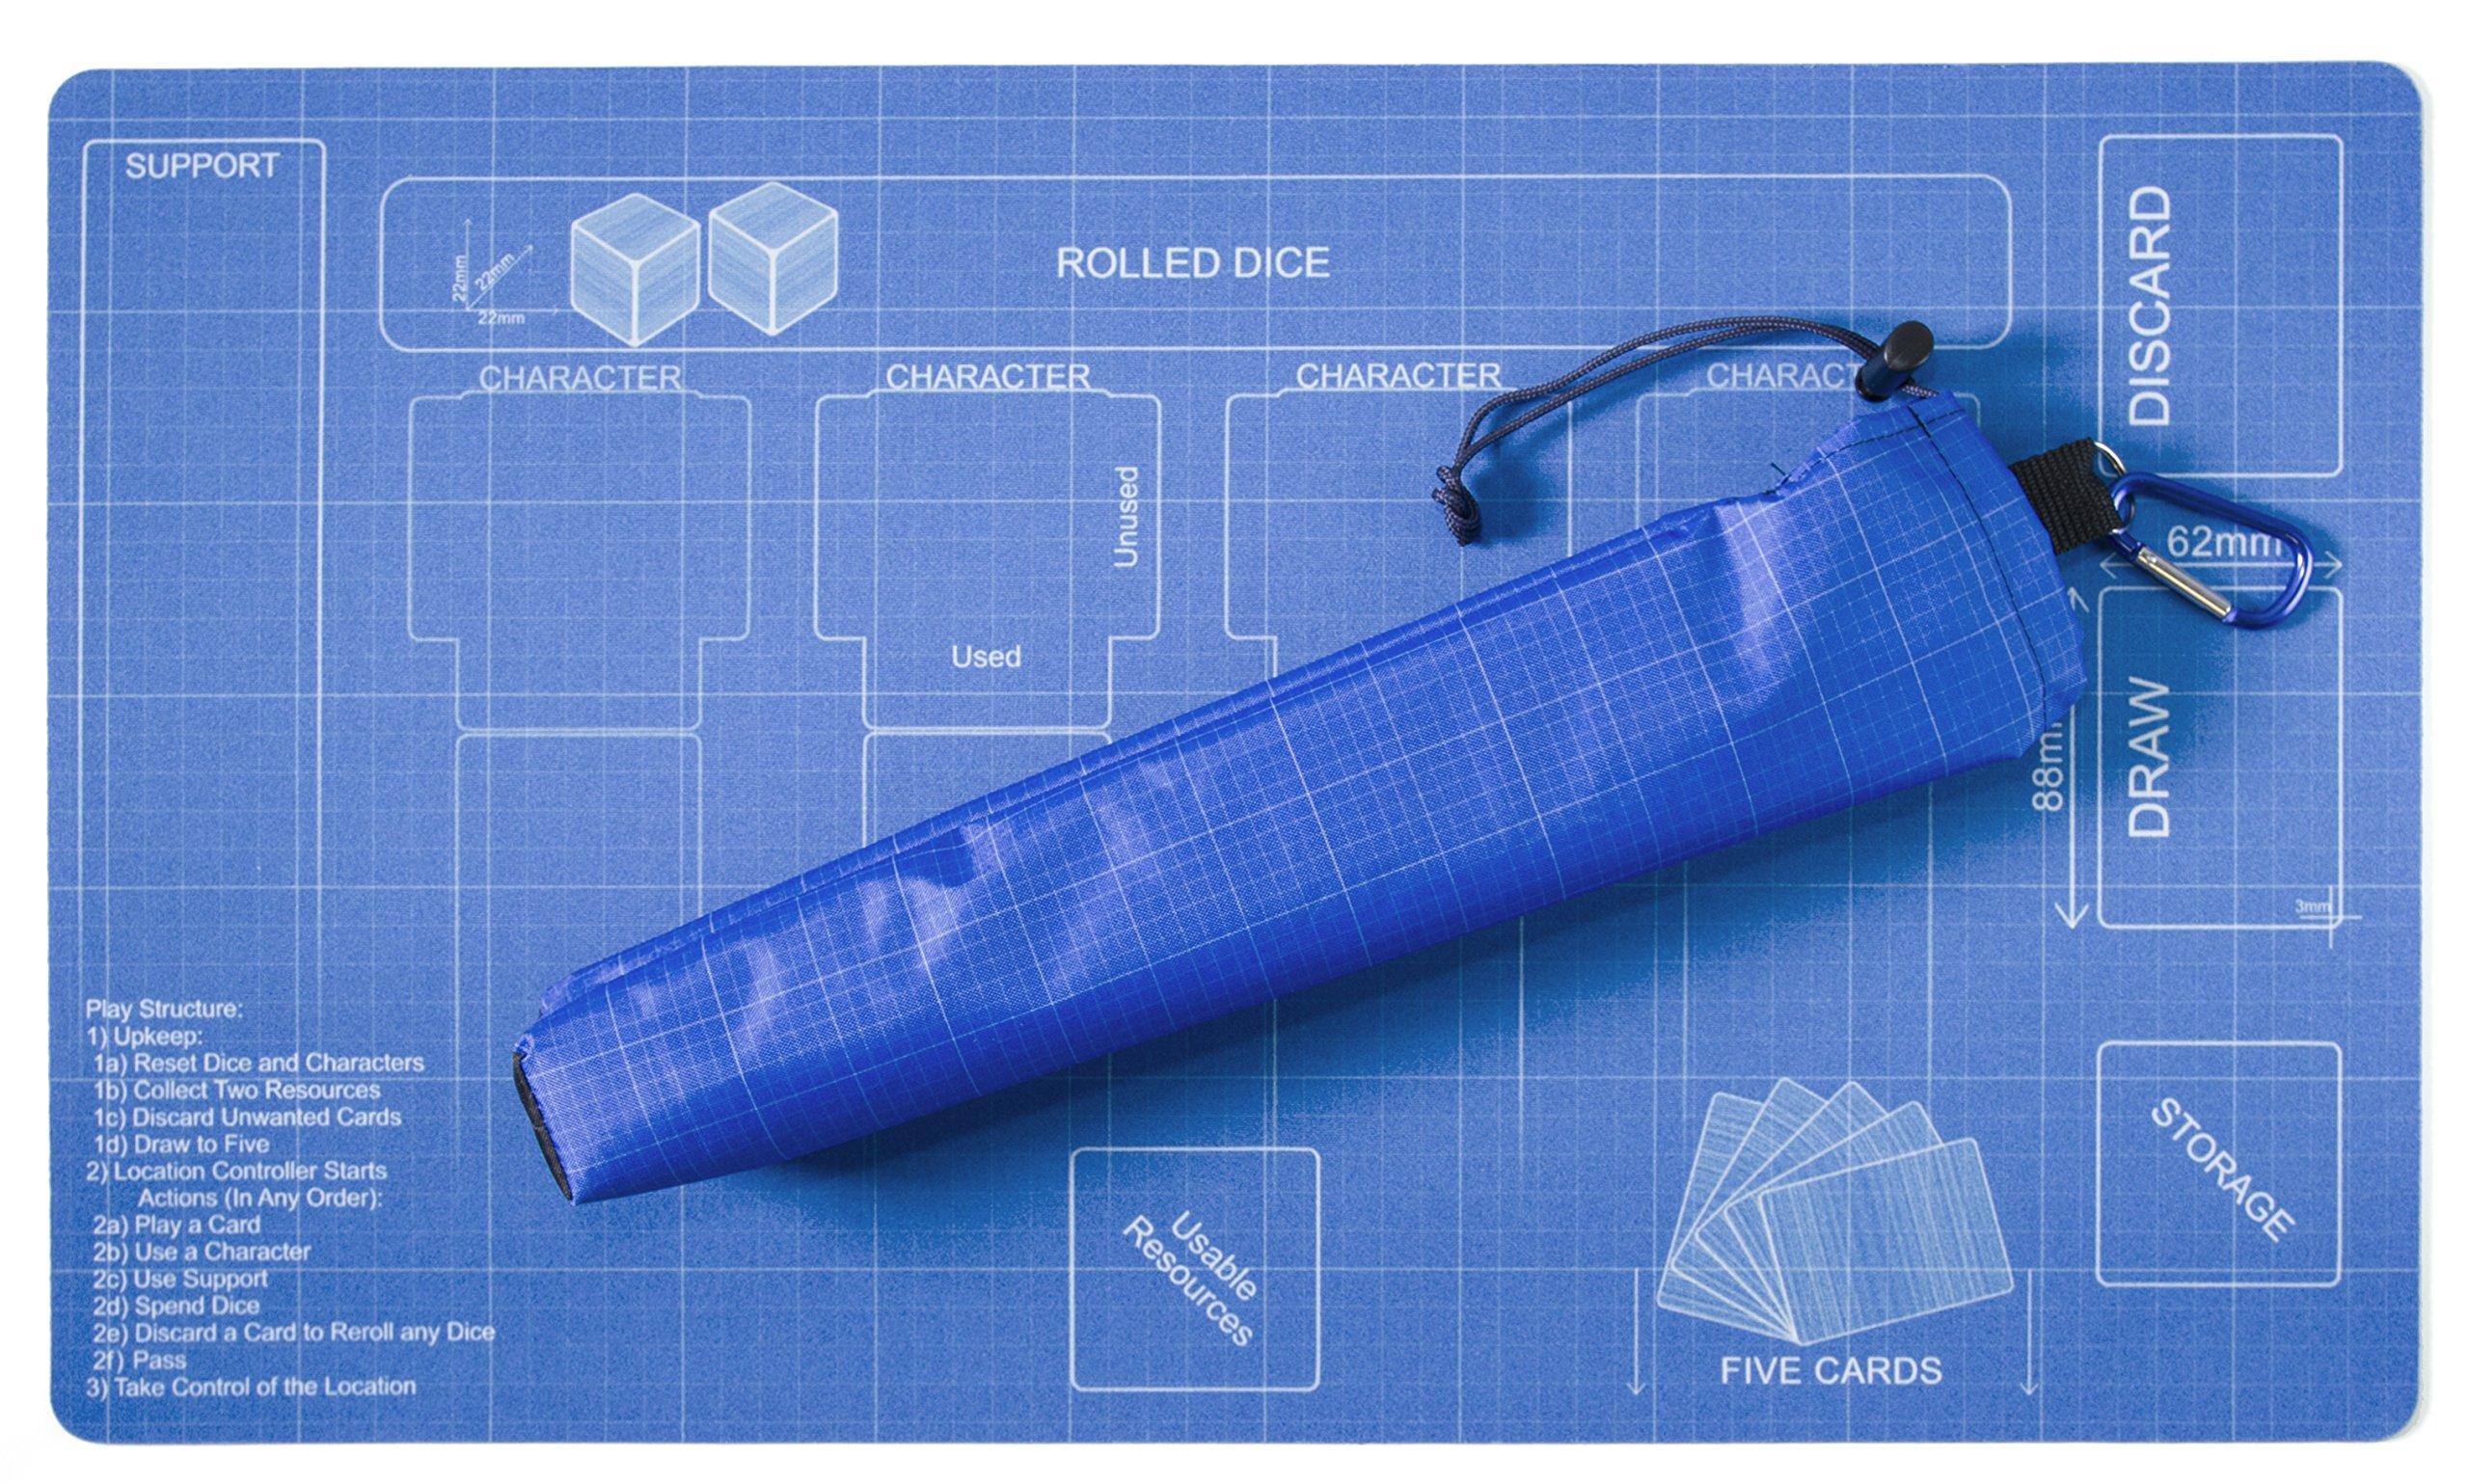 Blueprint Destiny Playmat Playmat Bag - Kit by Inked Gaming / Perfect for SW: Destiny Playmat Tube Plus Playmat